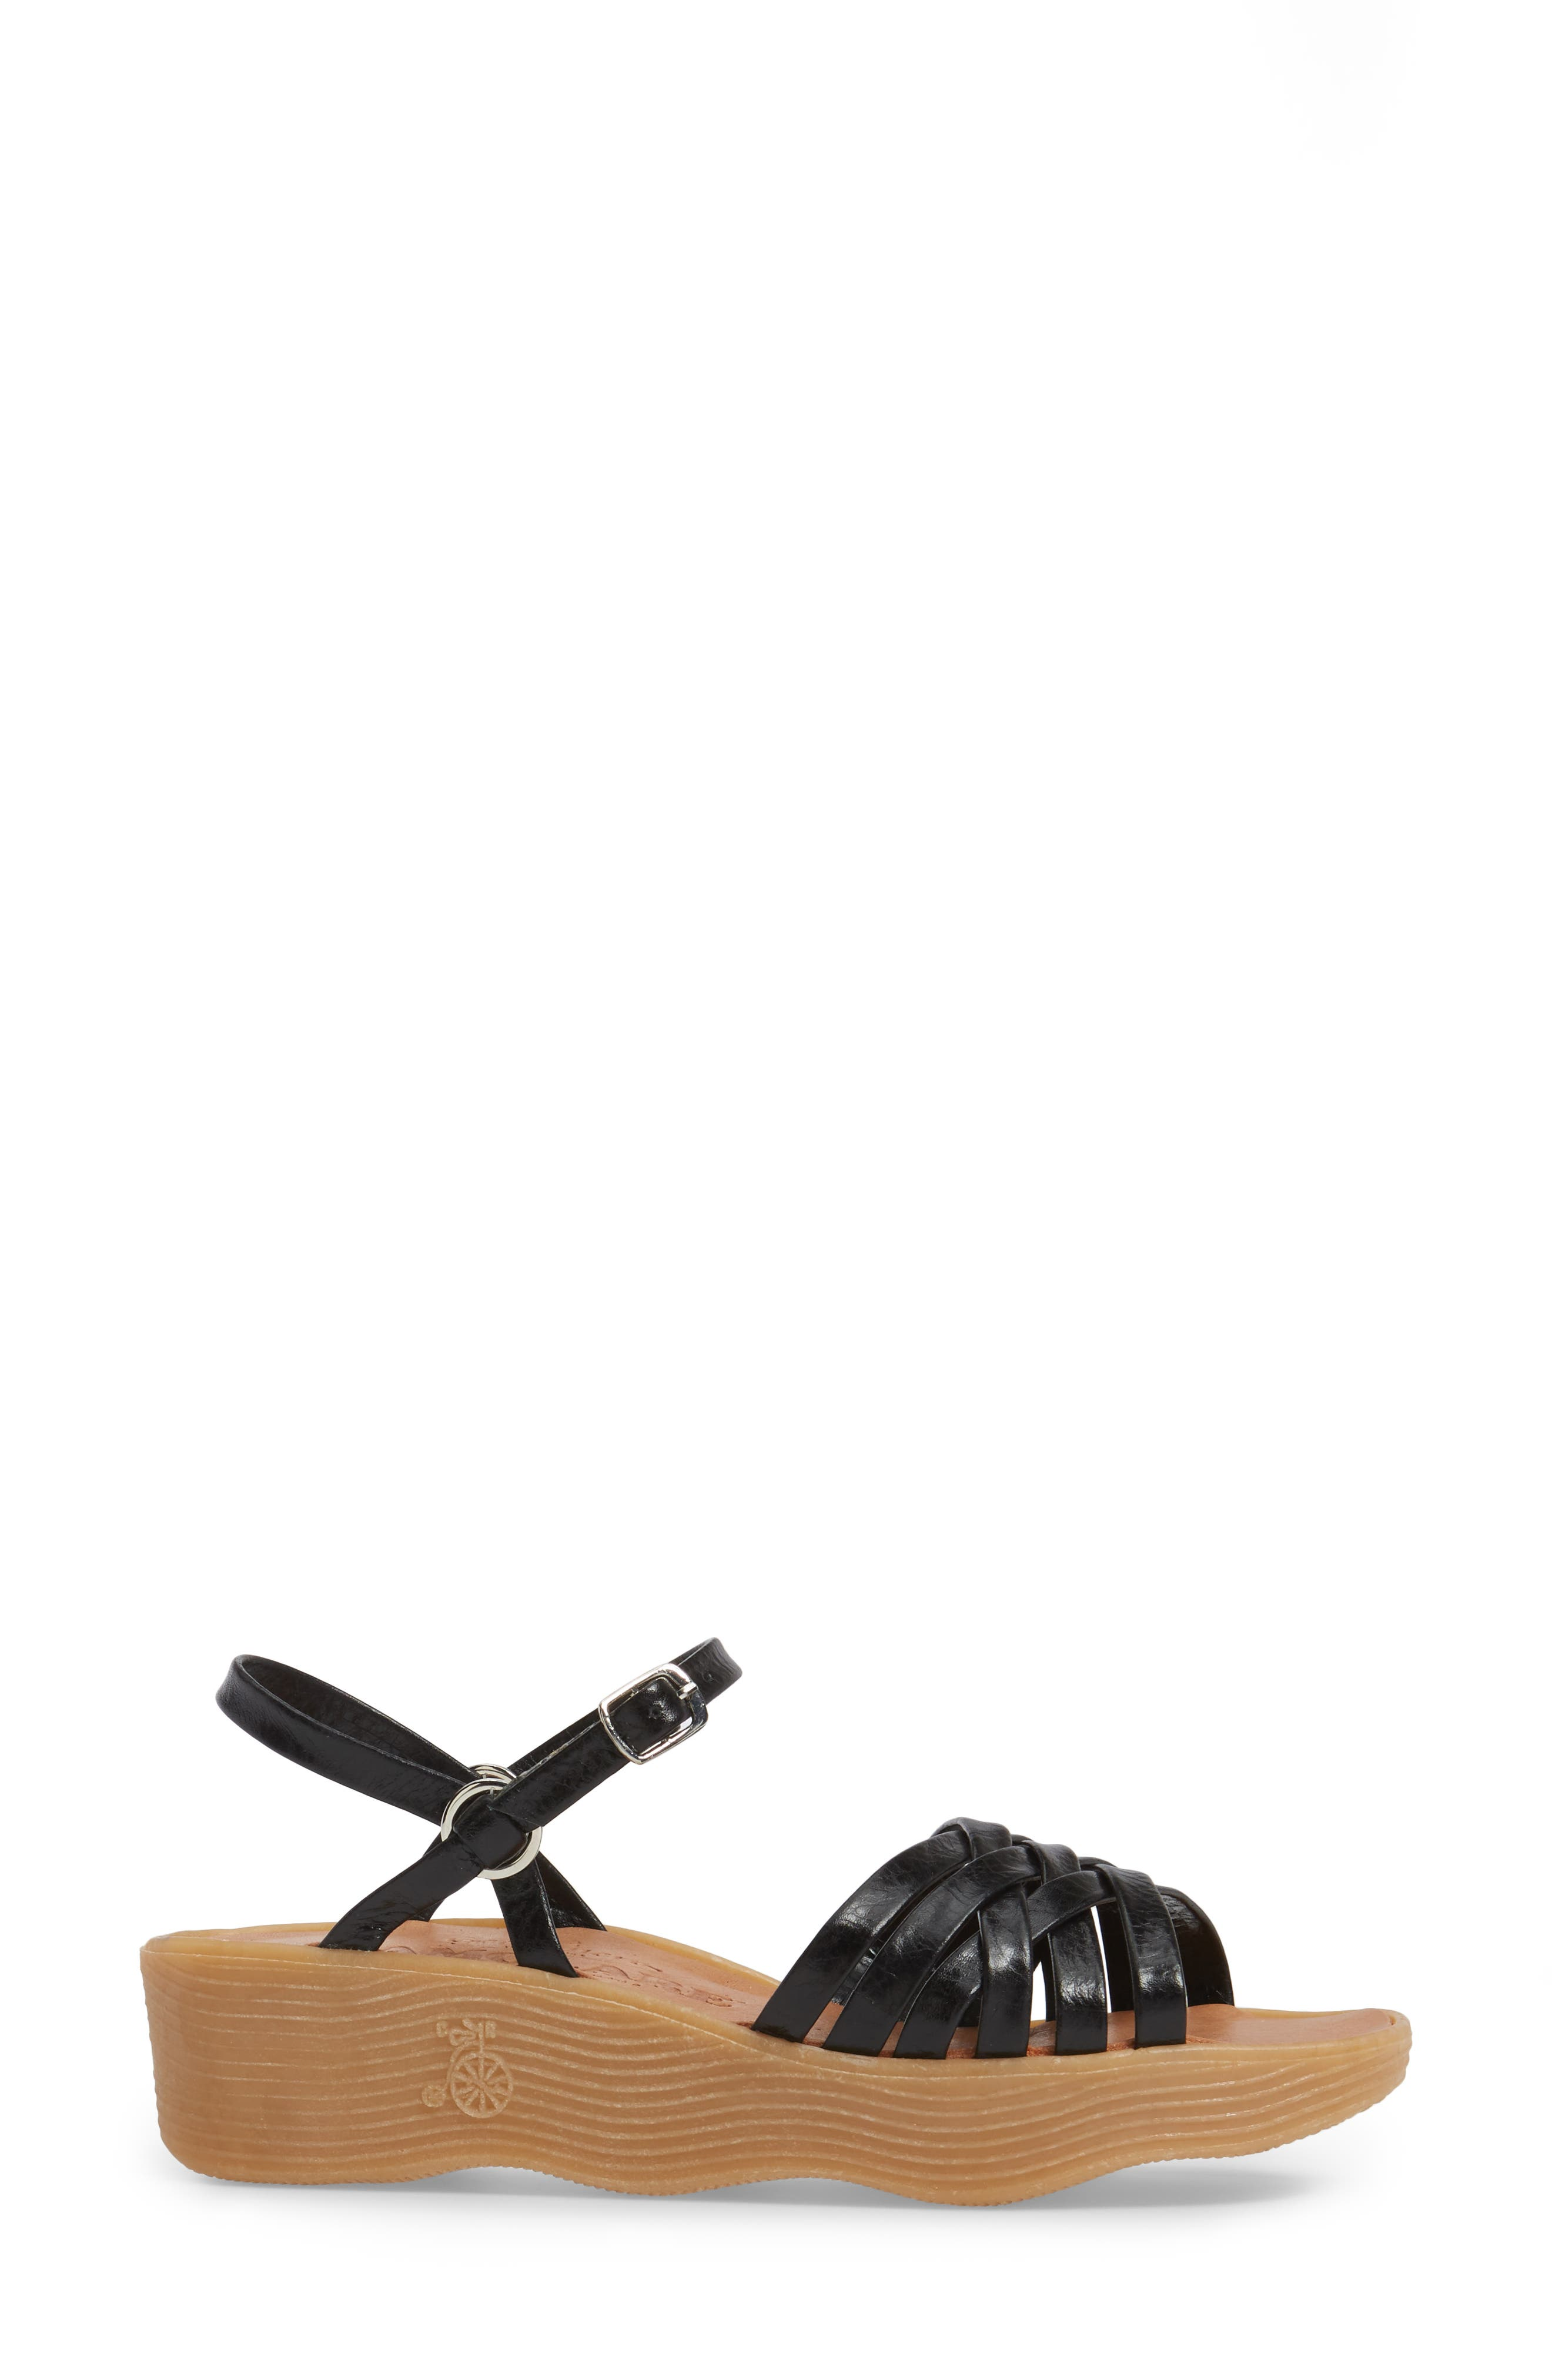 Alternate Image 3  - Famolare Strappy Camper Sandal (Women)